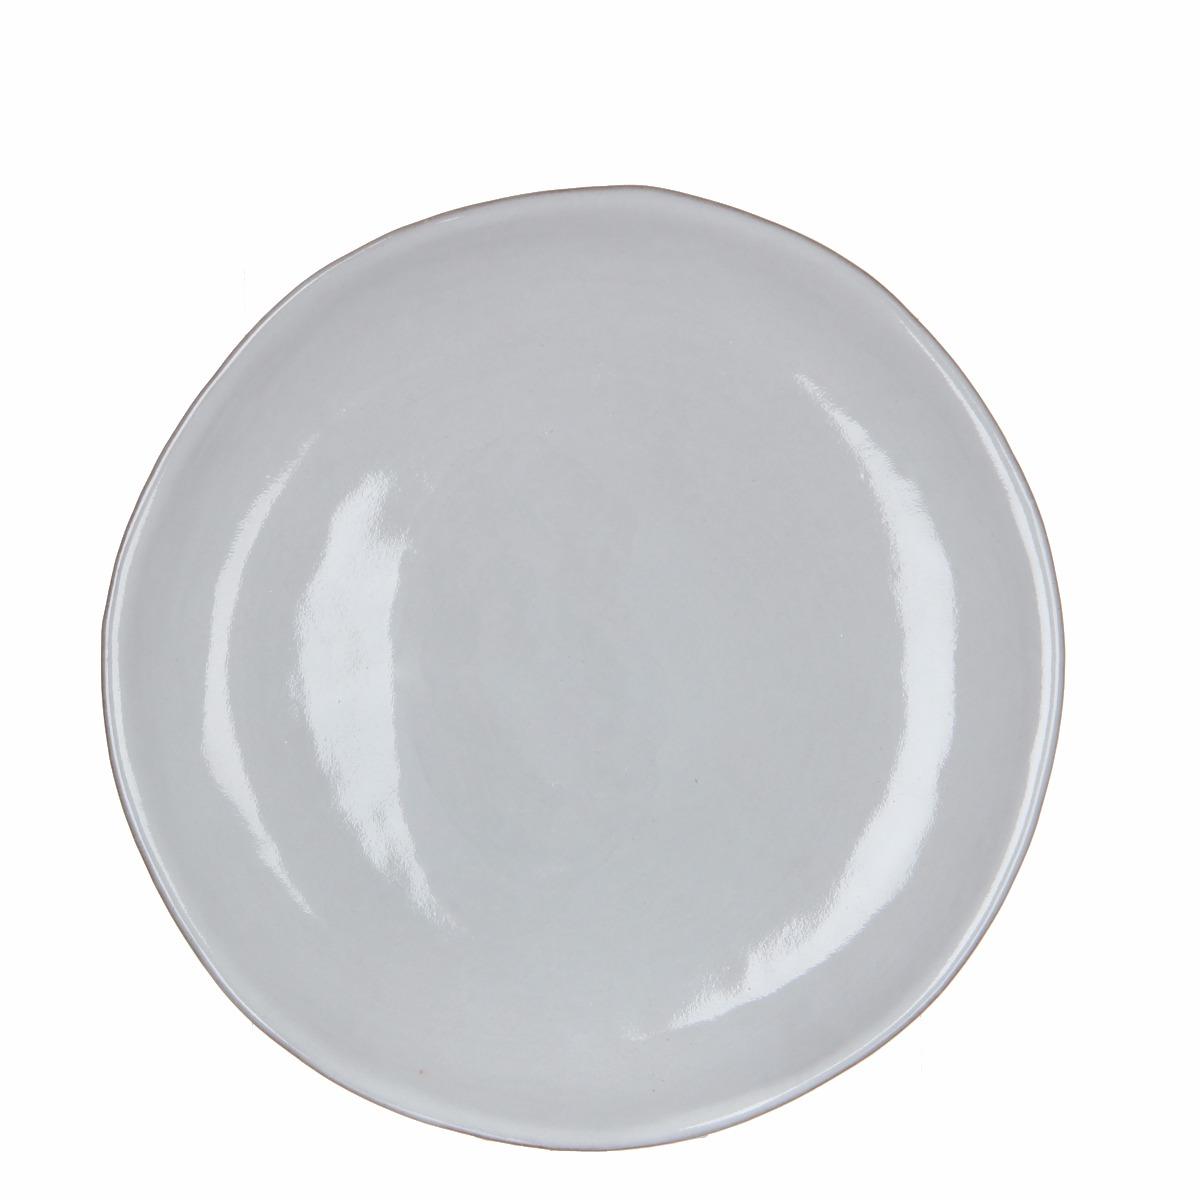 Afbeelding van Casa vivante bord ursula wit h2xd29cm